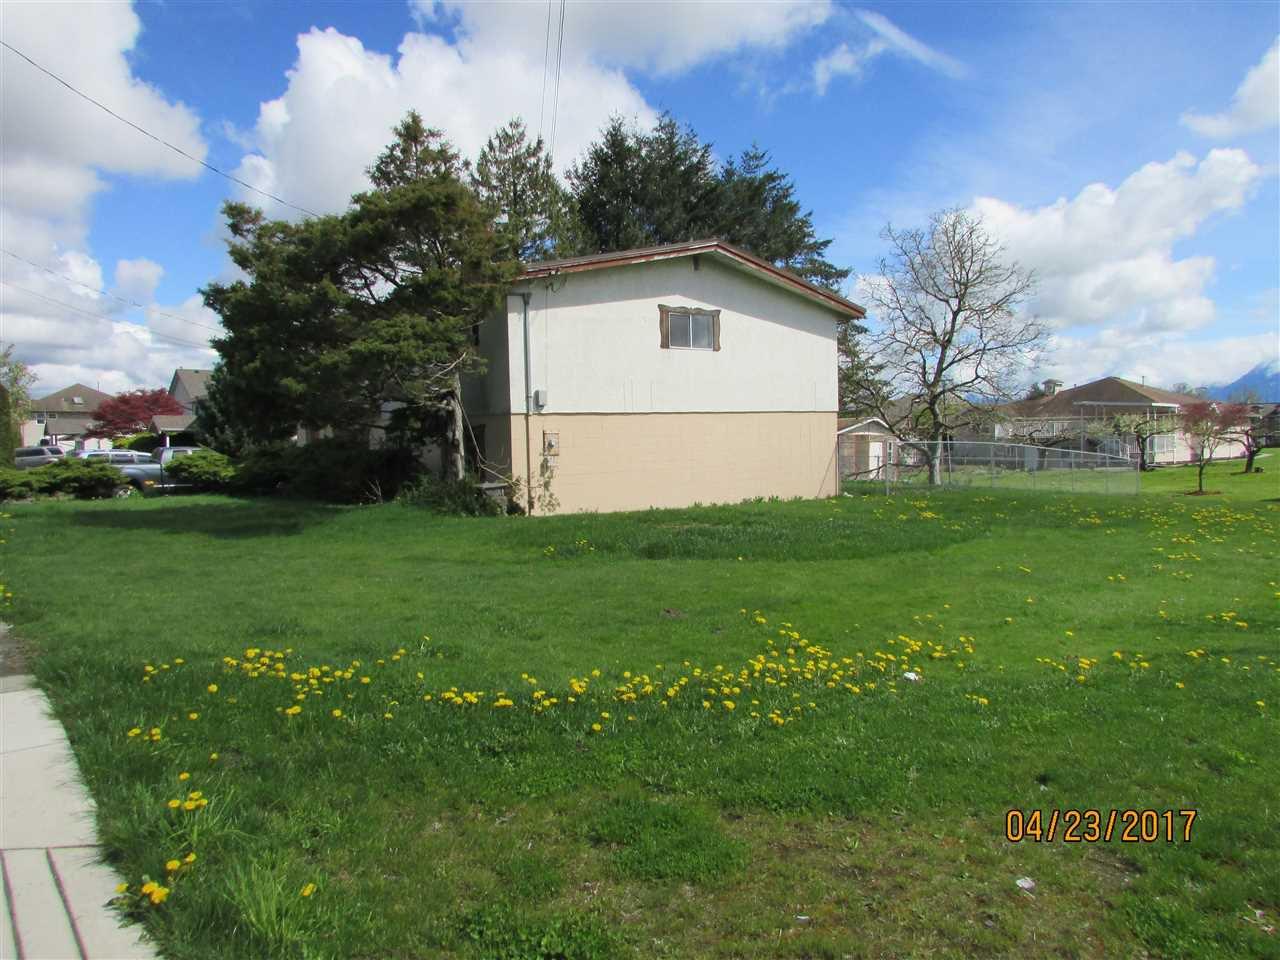 Photo 2: Photos: 7220 EVANS Road in Sardis: Sardis West Vedder Rd House for sale : MLS®# R2160379